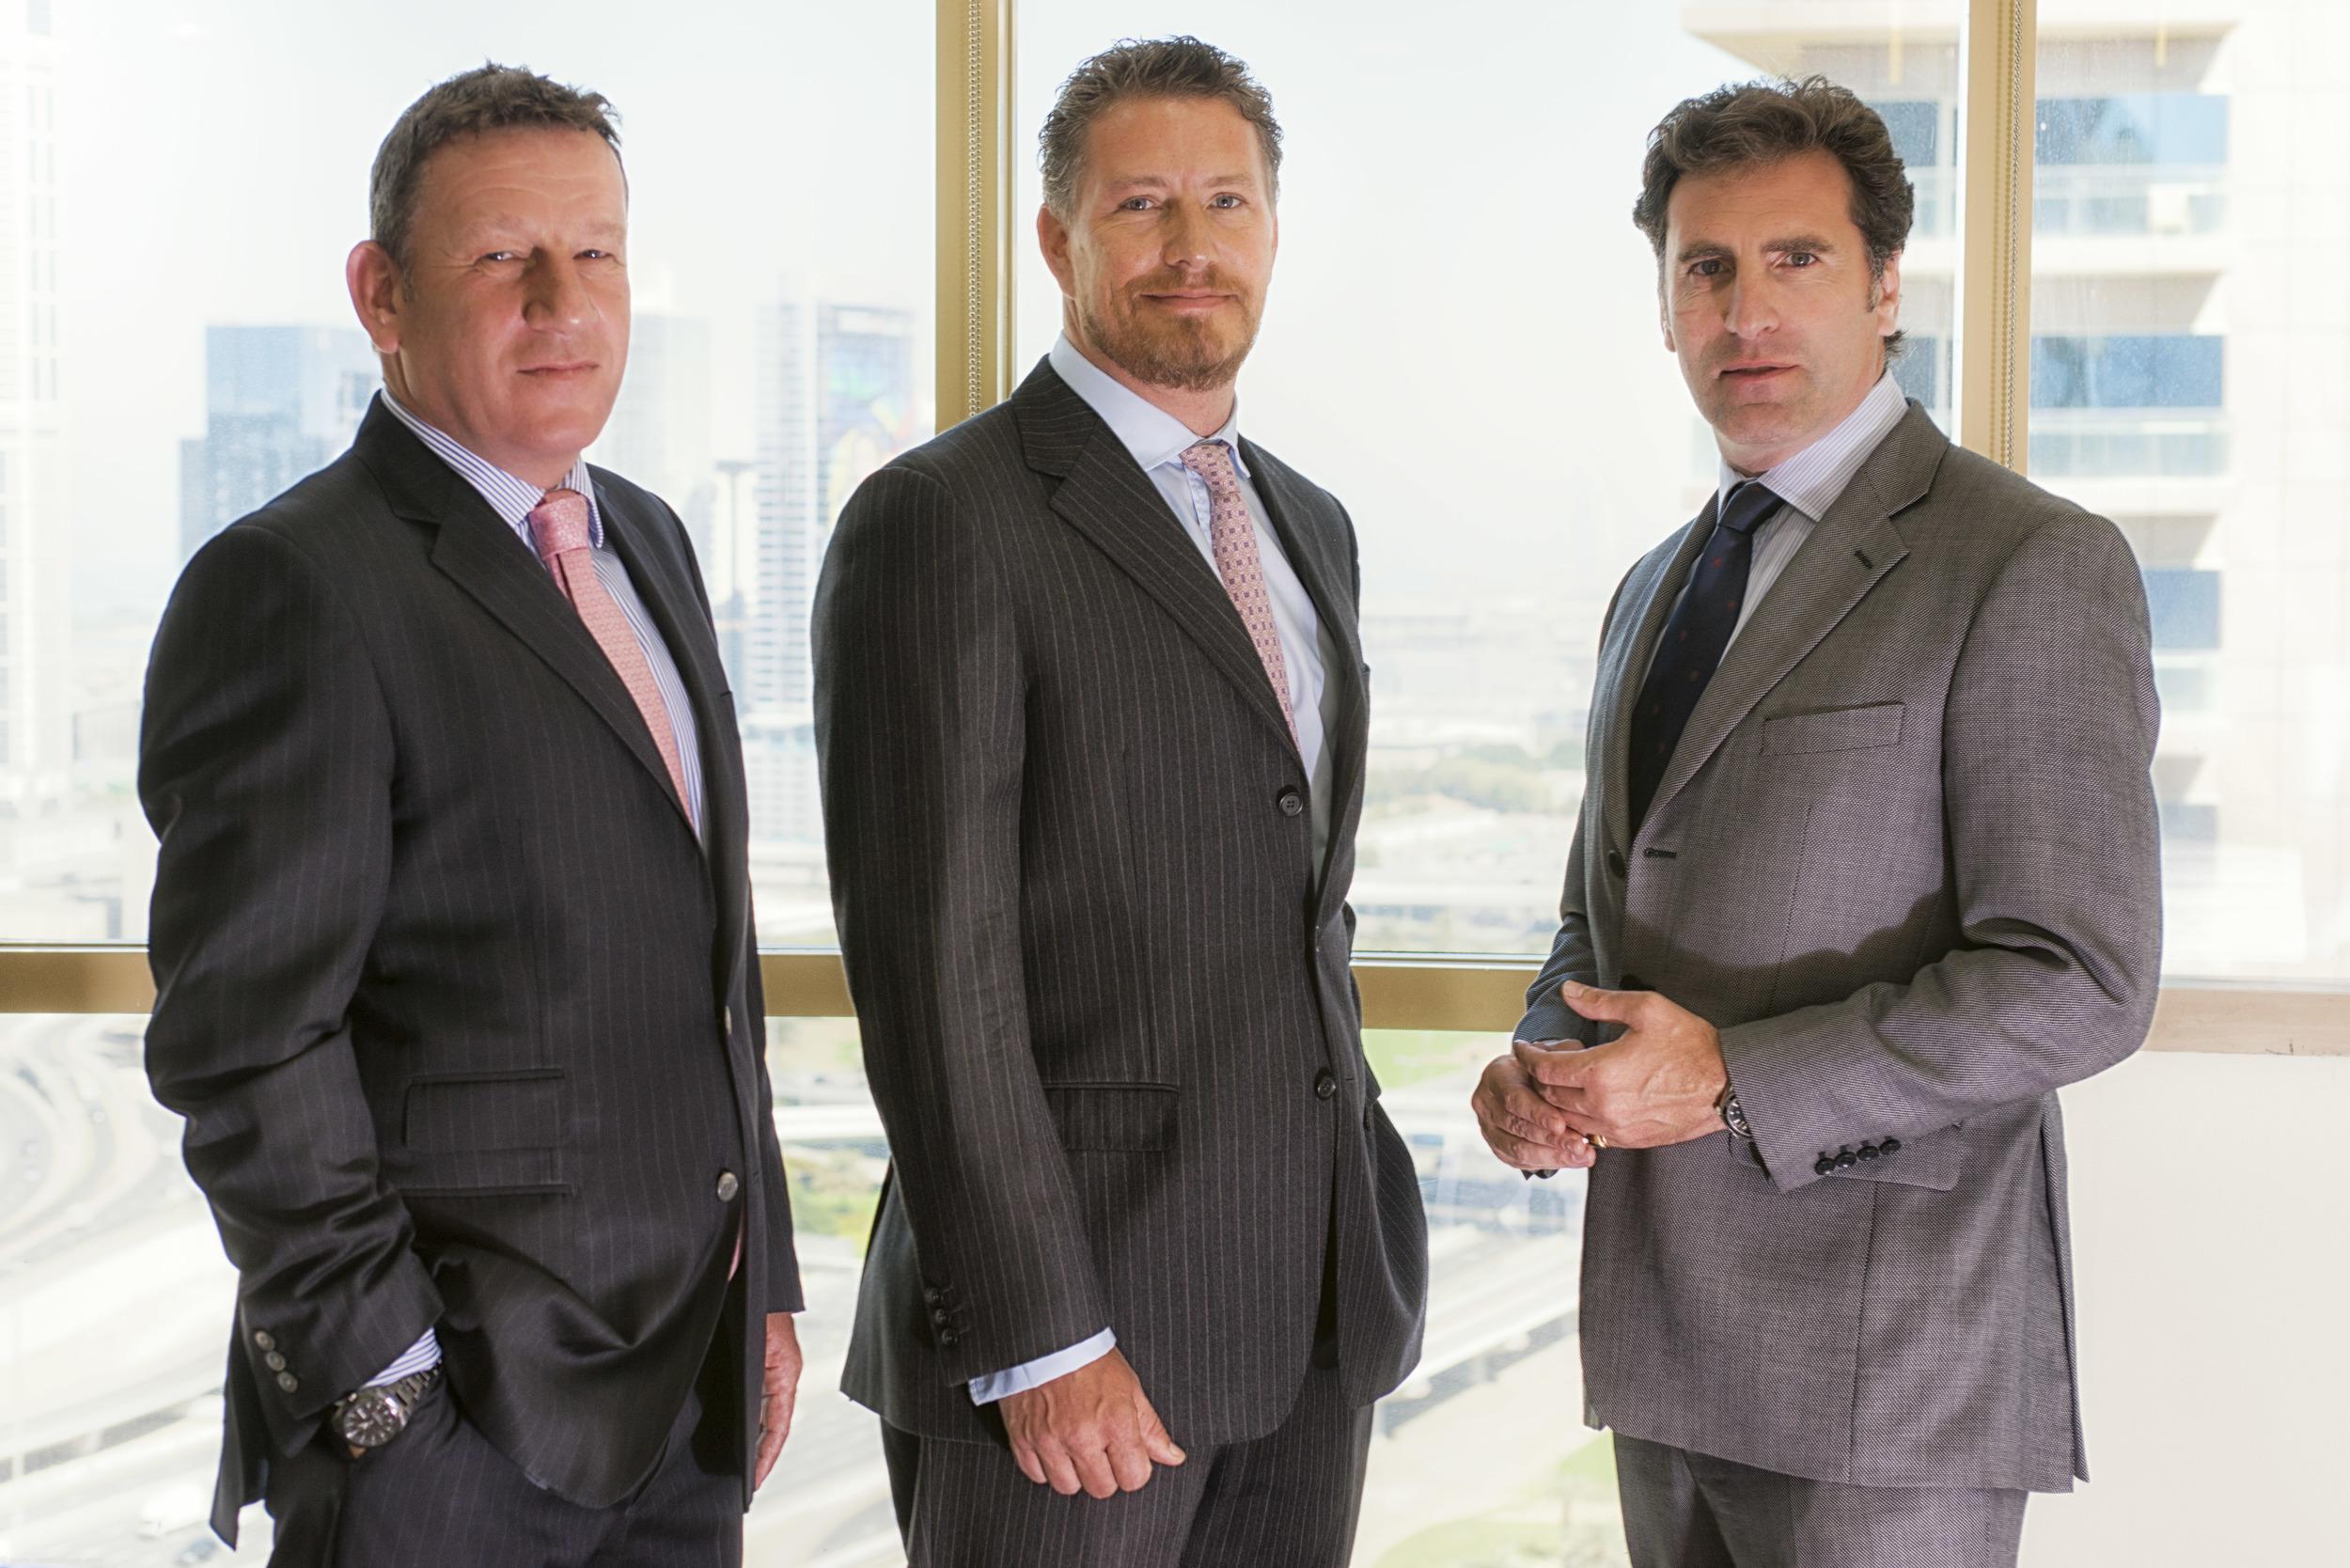 UAE-DXB-Hart-Headshots-Group-12.jpg